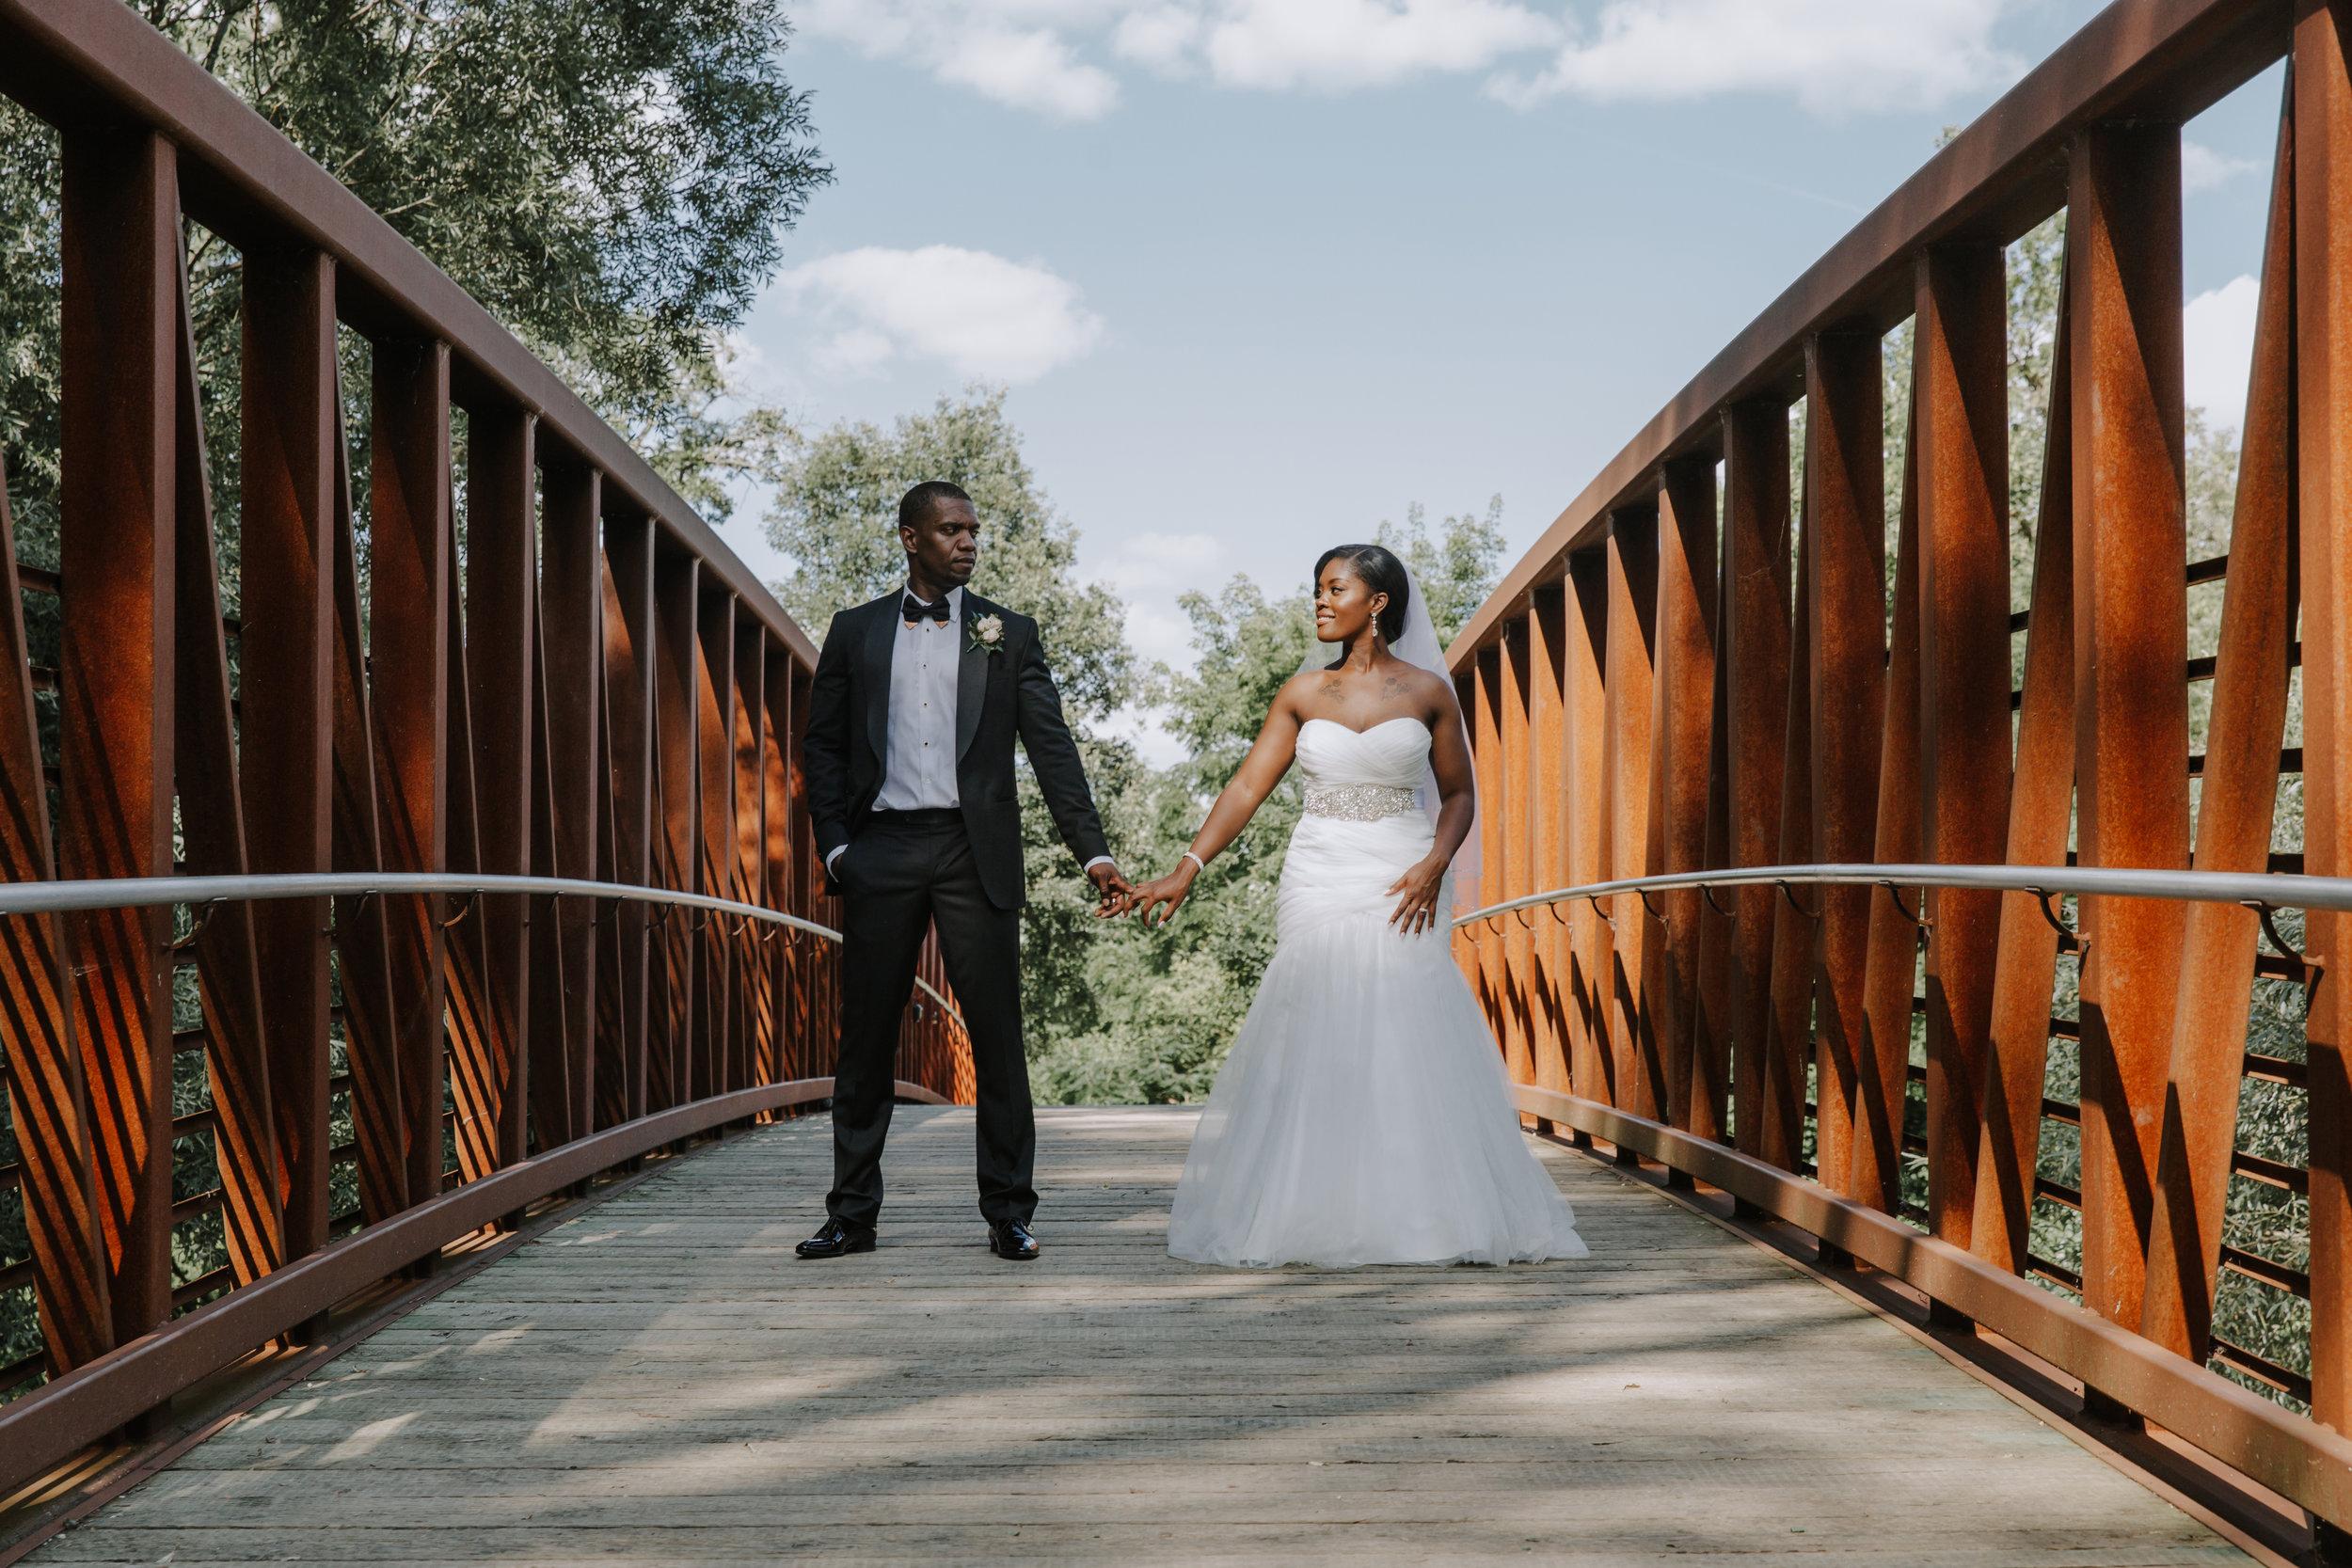 Jessica-Silveira-Photography-Toronto-Wedding-Photographer.jpg